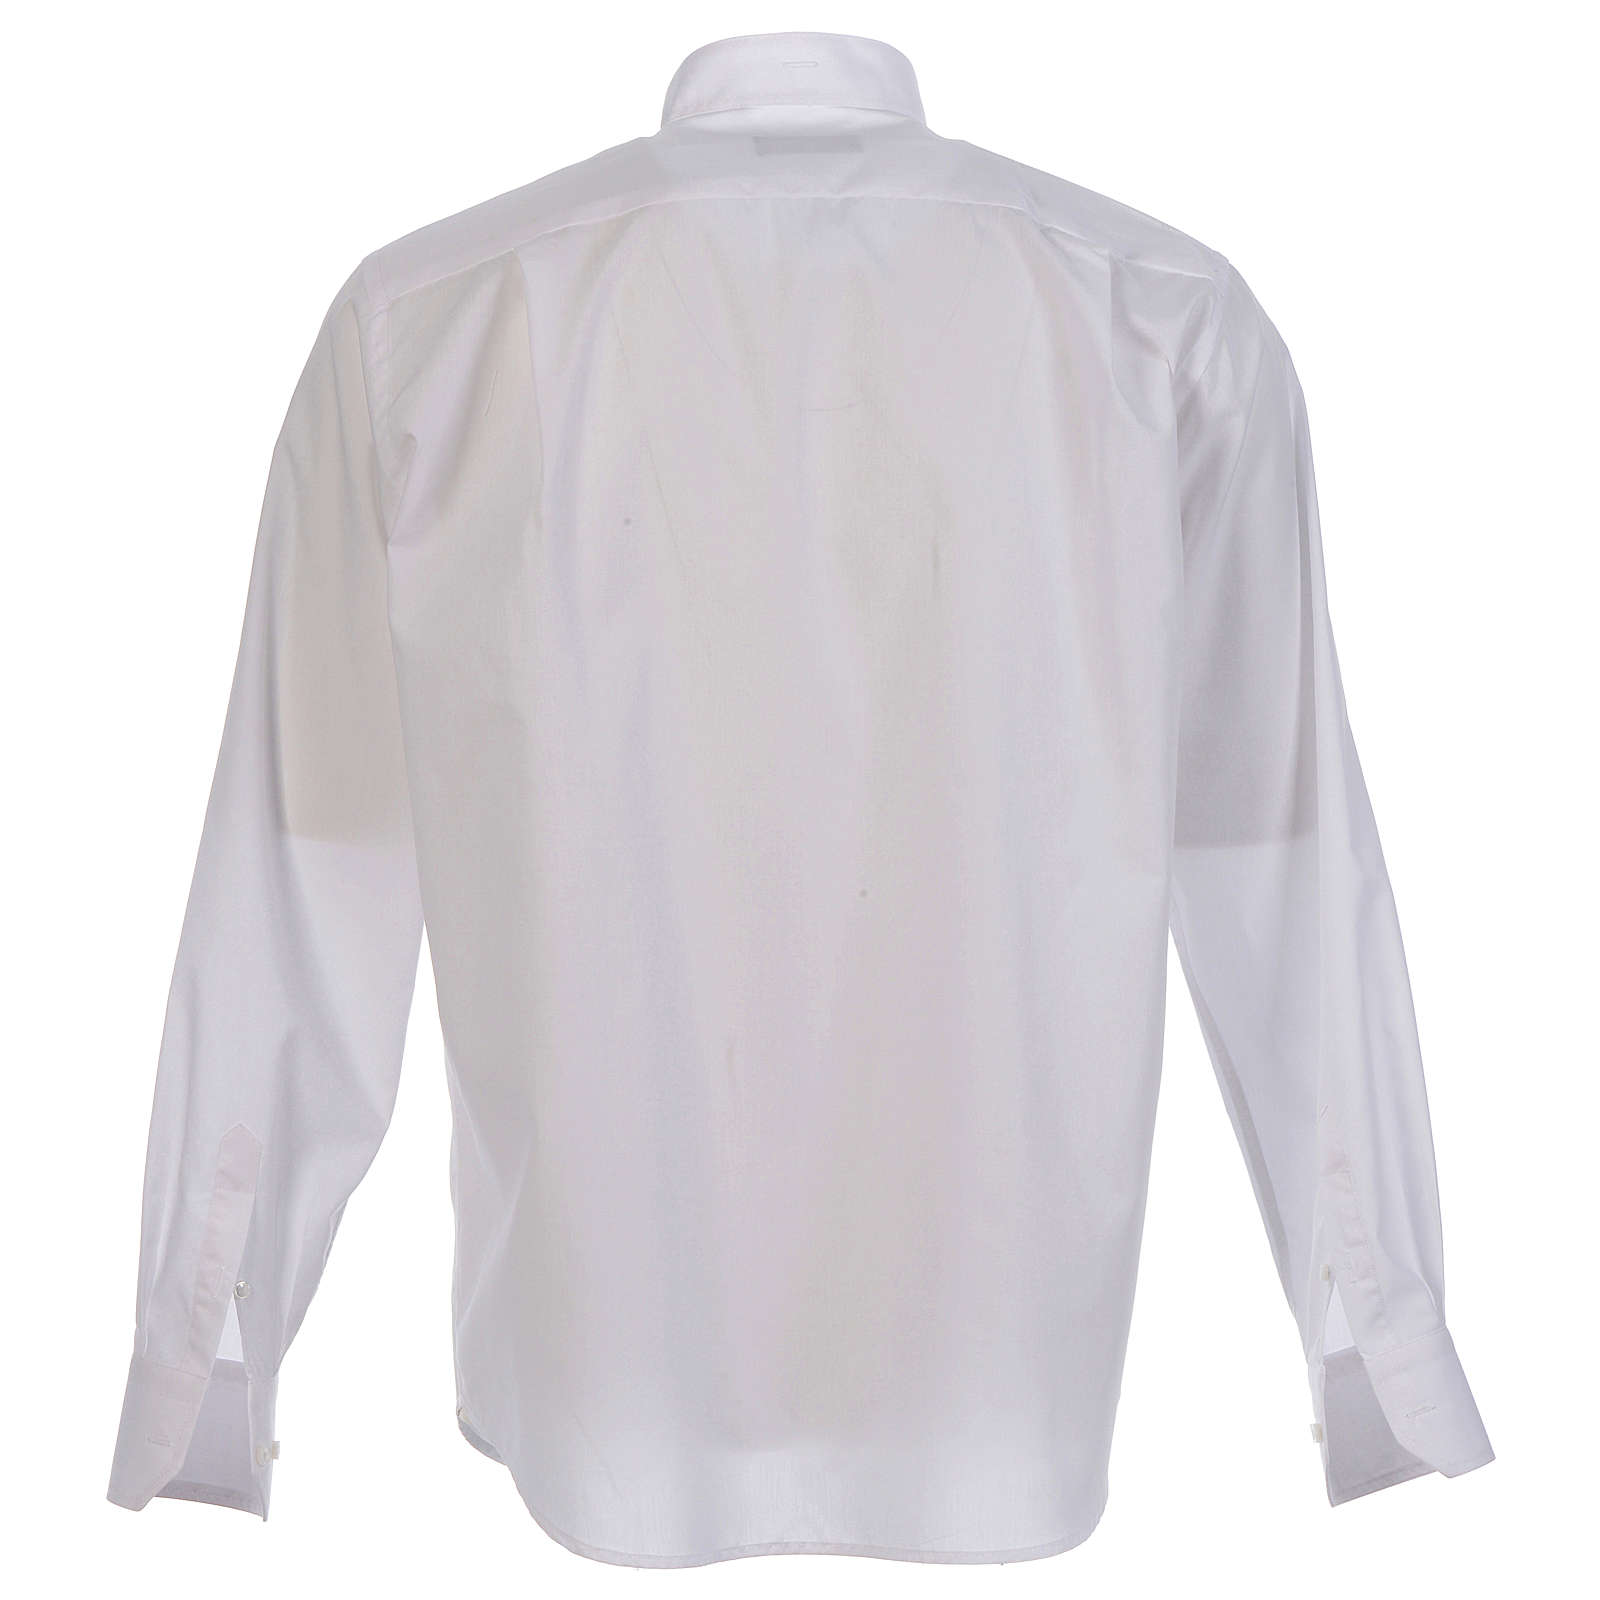 Camisa clergy sacerdote hábito talar cuello abierto manga larga 4